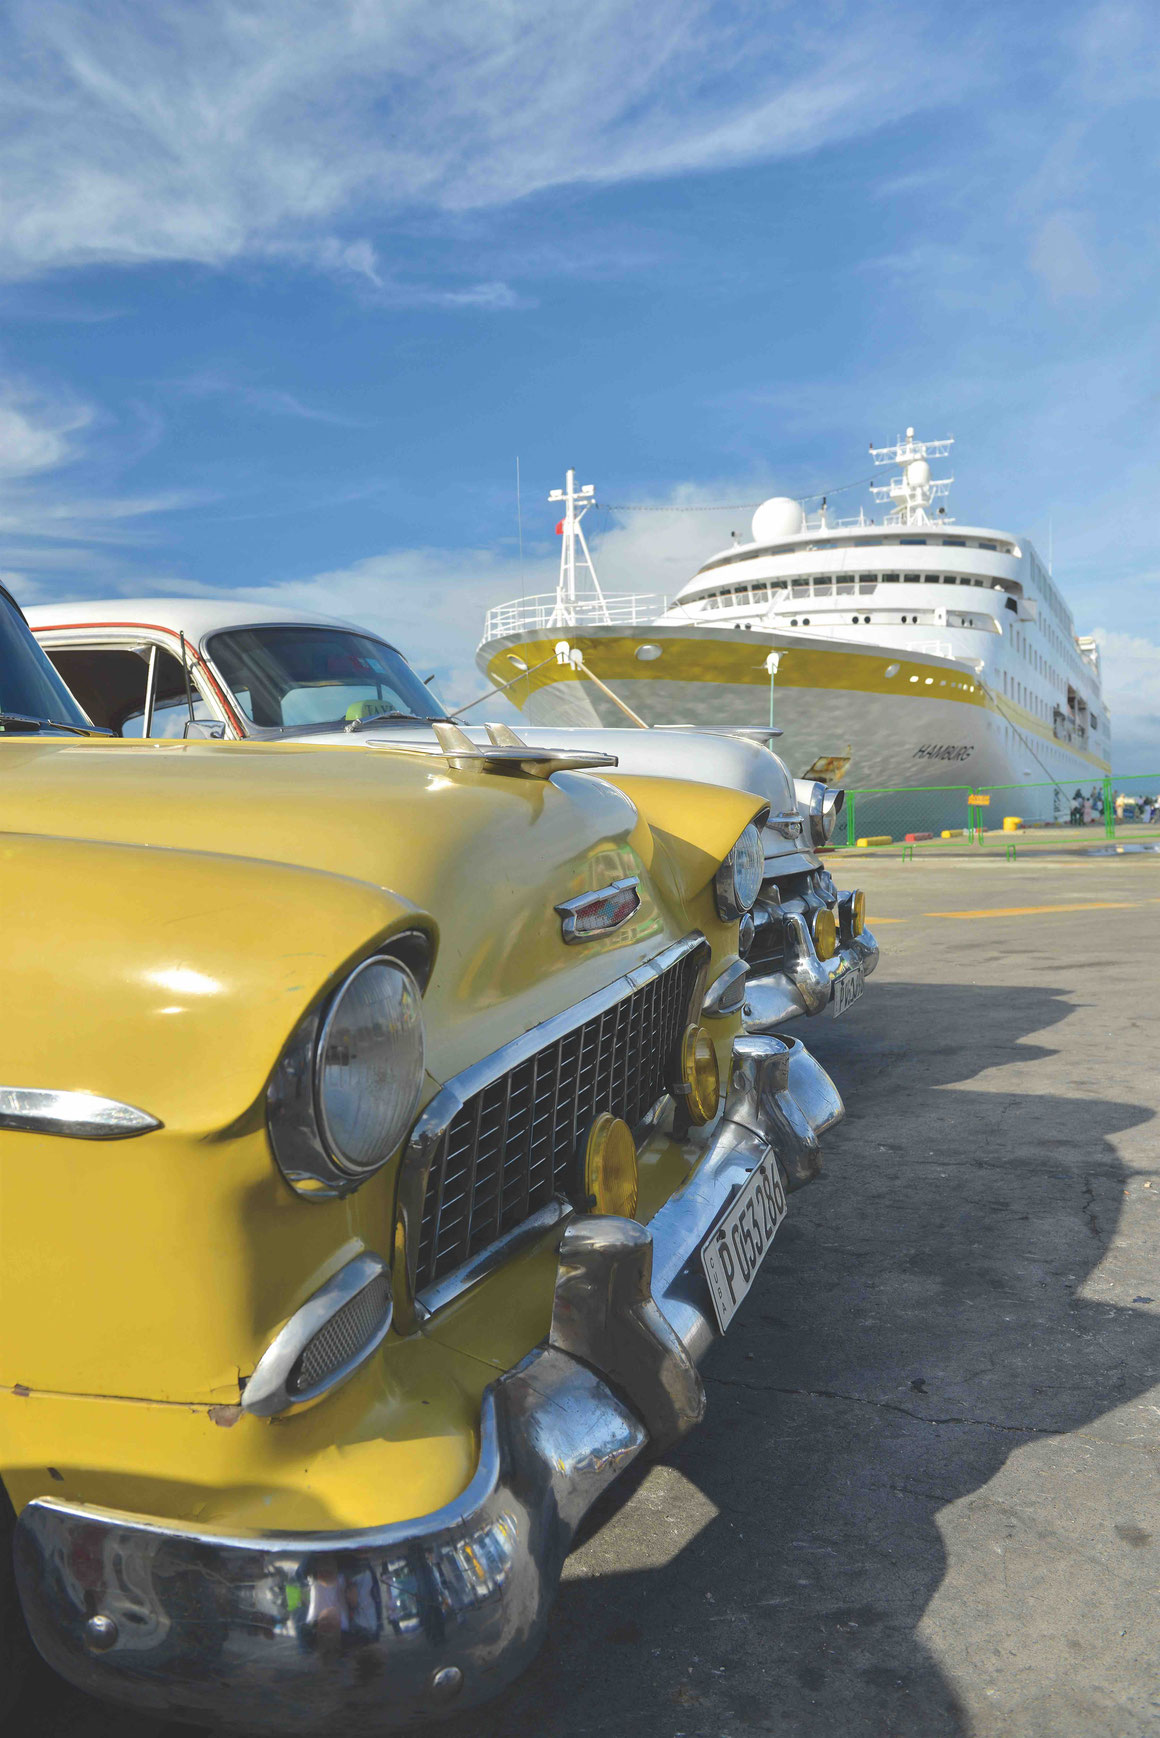 MS Hamburg in Santiago de Cuba